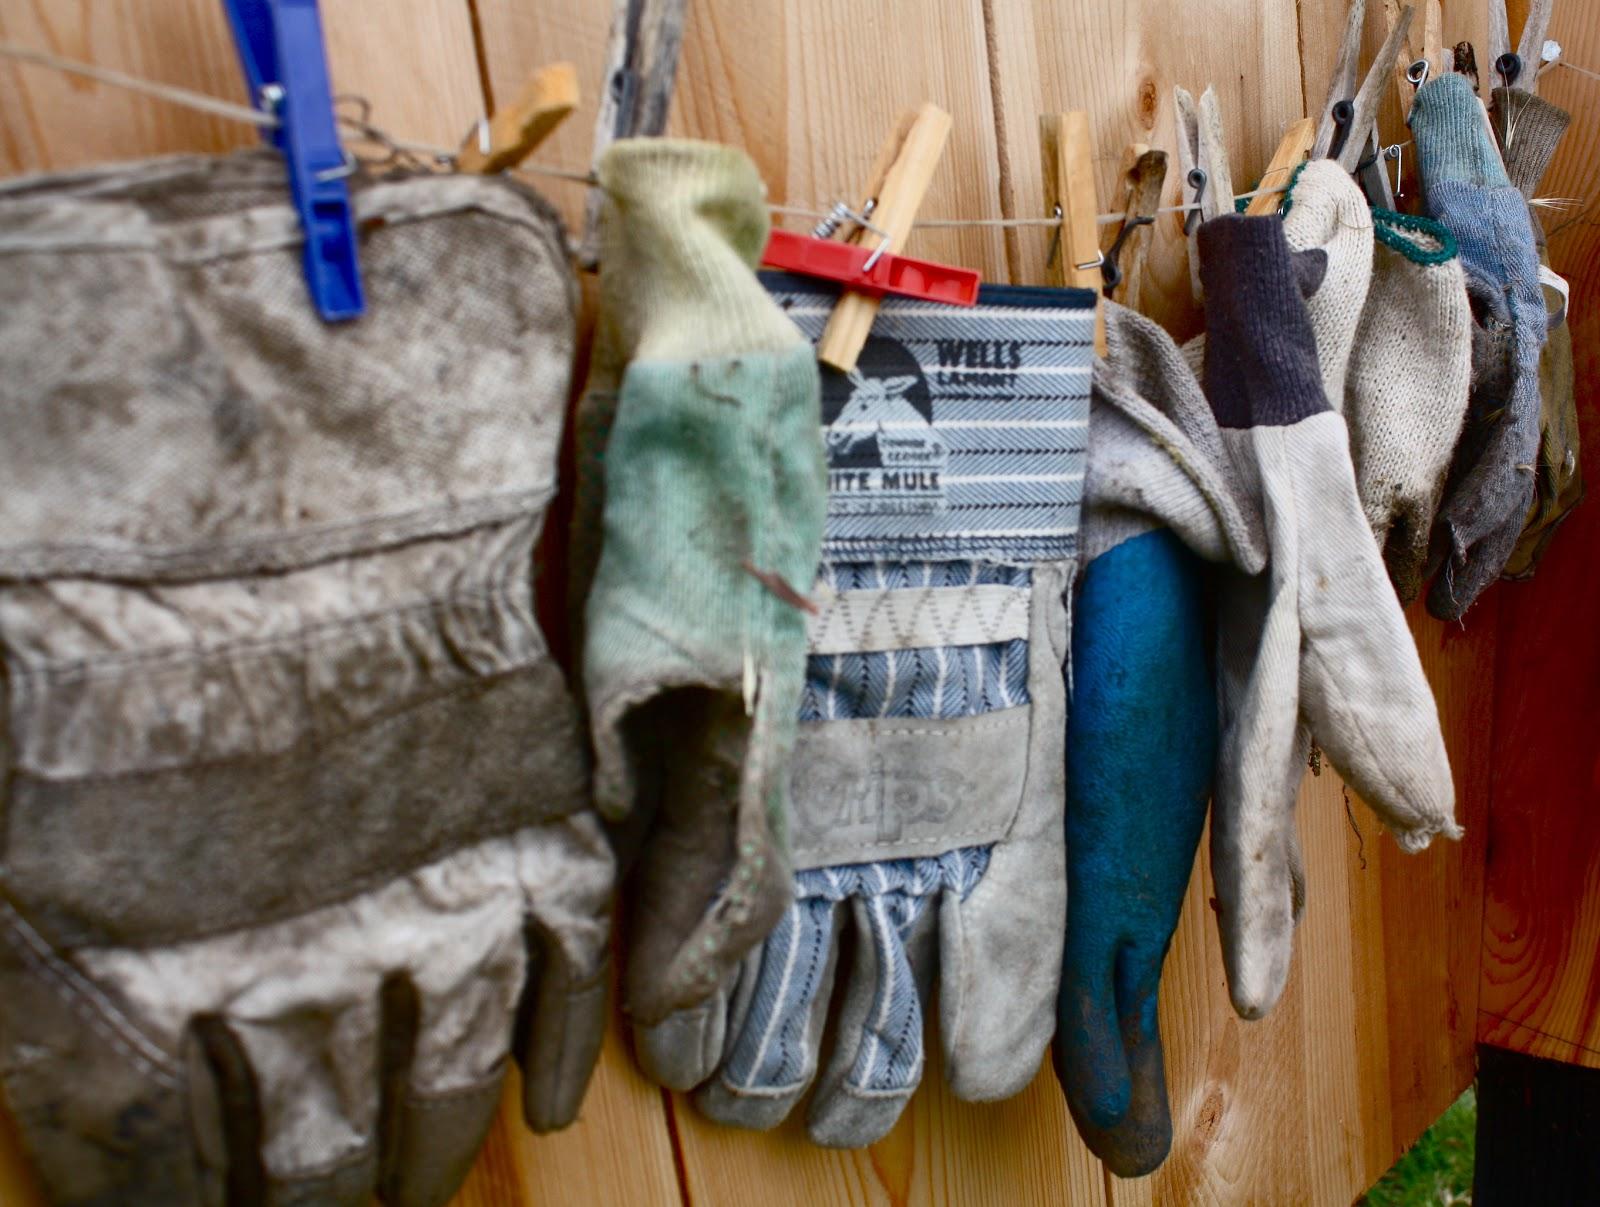 Hanging gloves